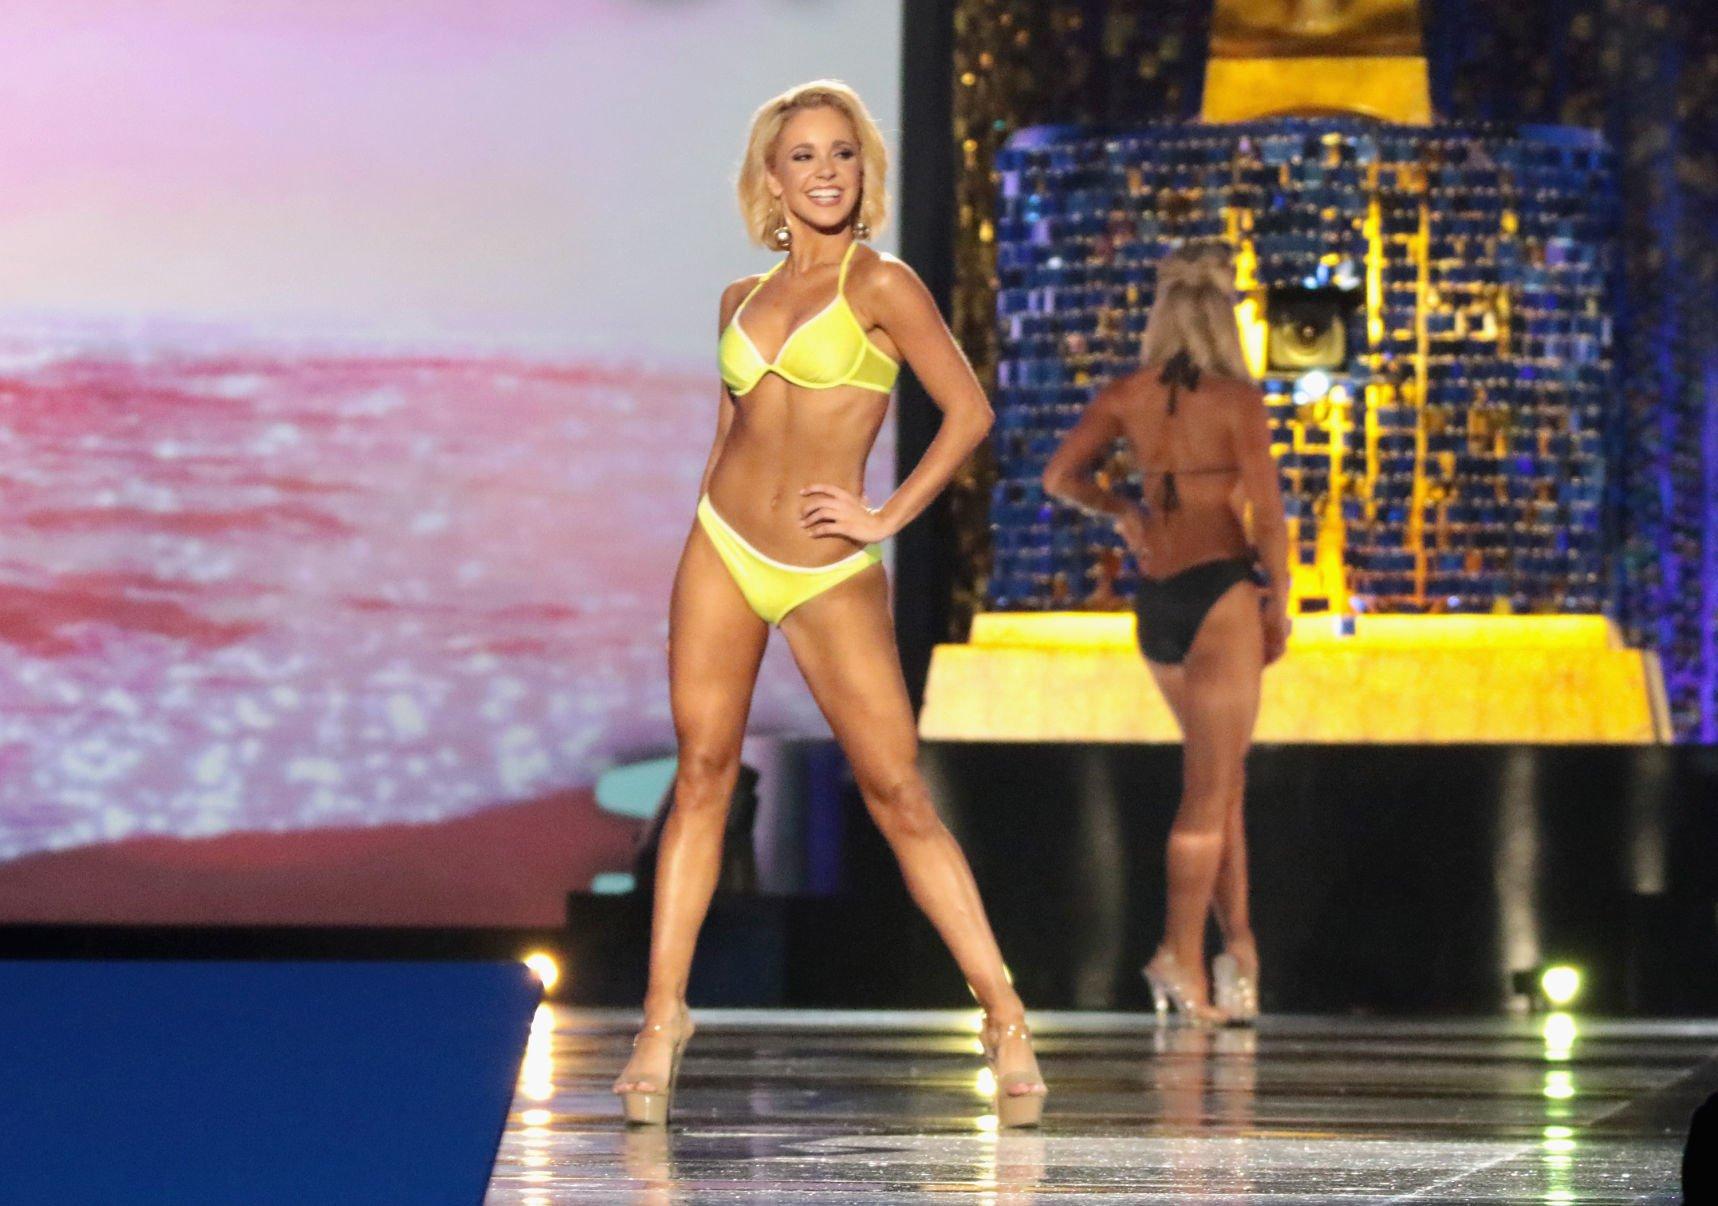 Bikini Jo Guest nude (72 photo), Tits, Leaked, Twitter, cleavage 2006